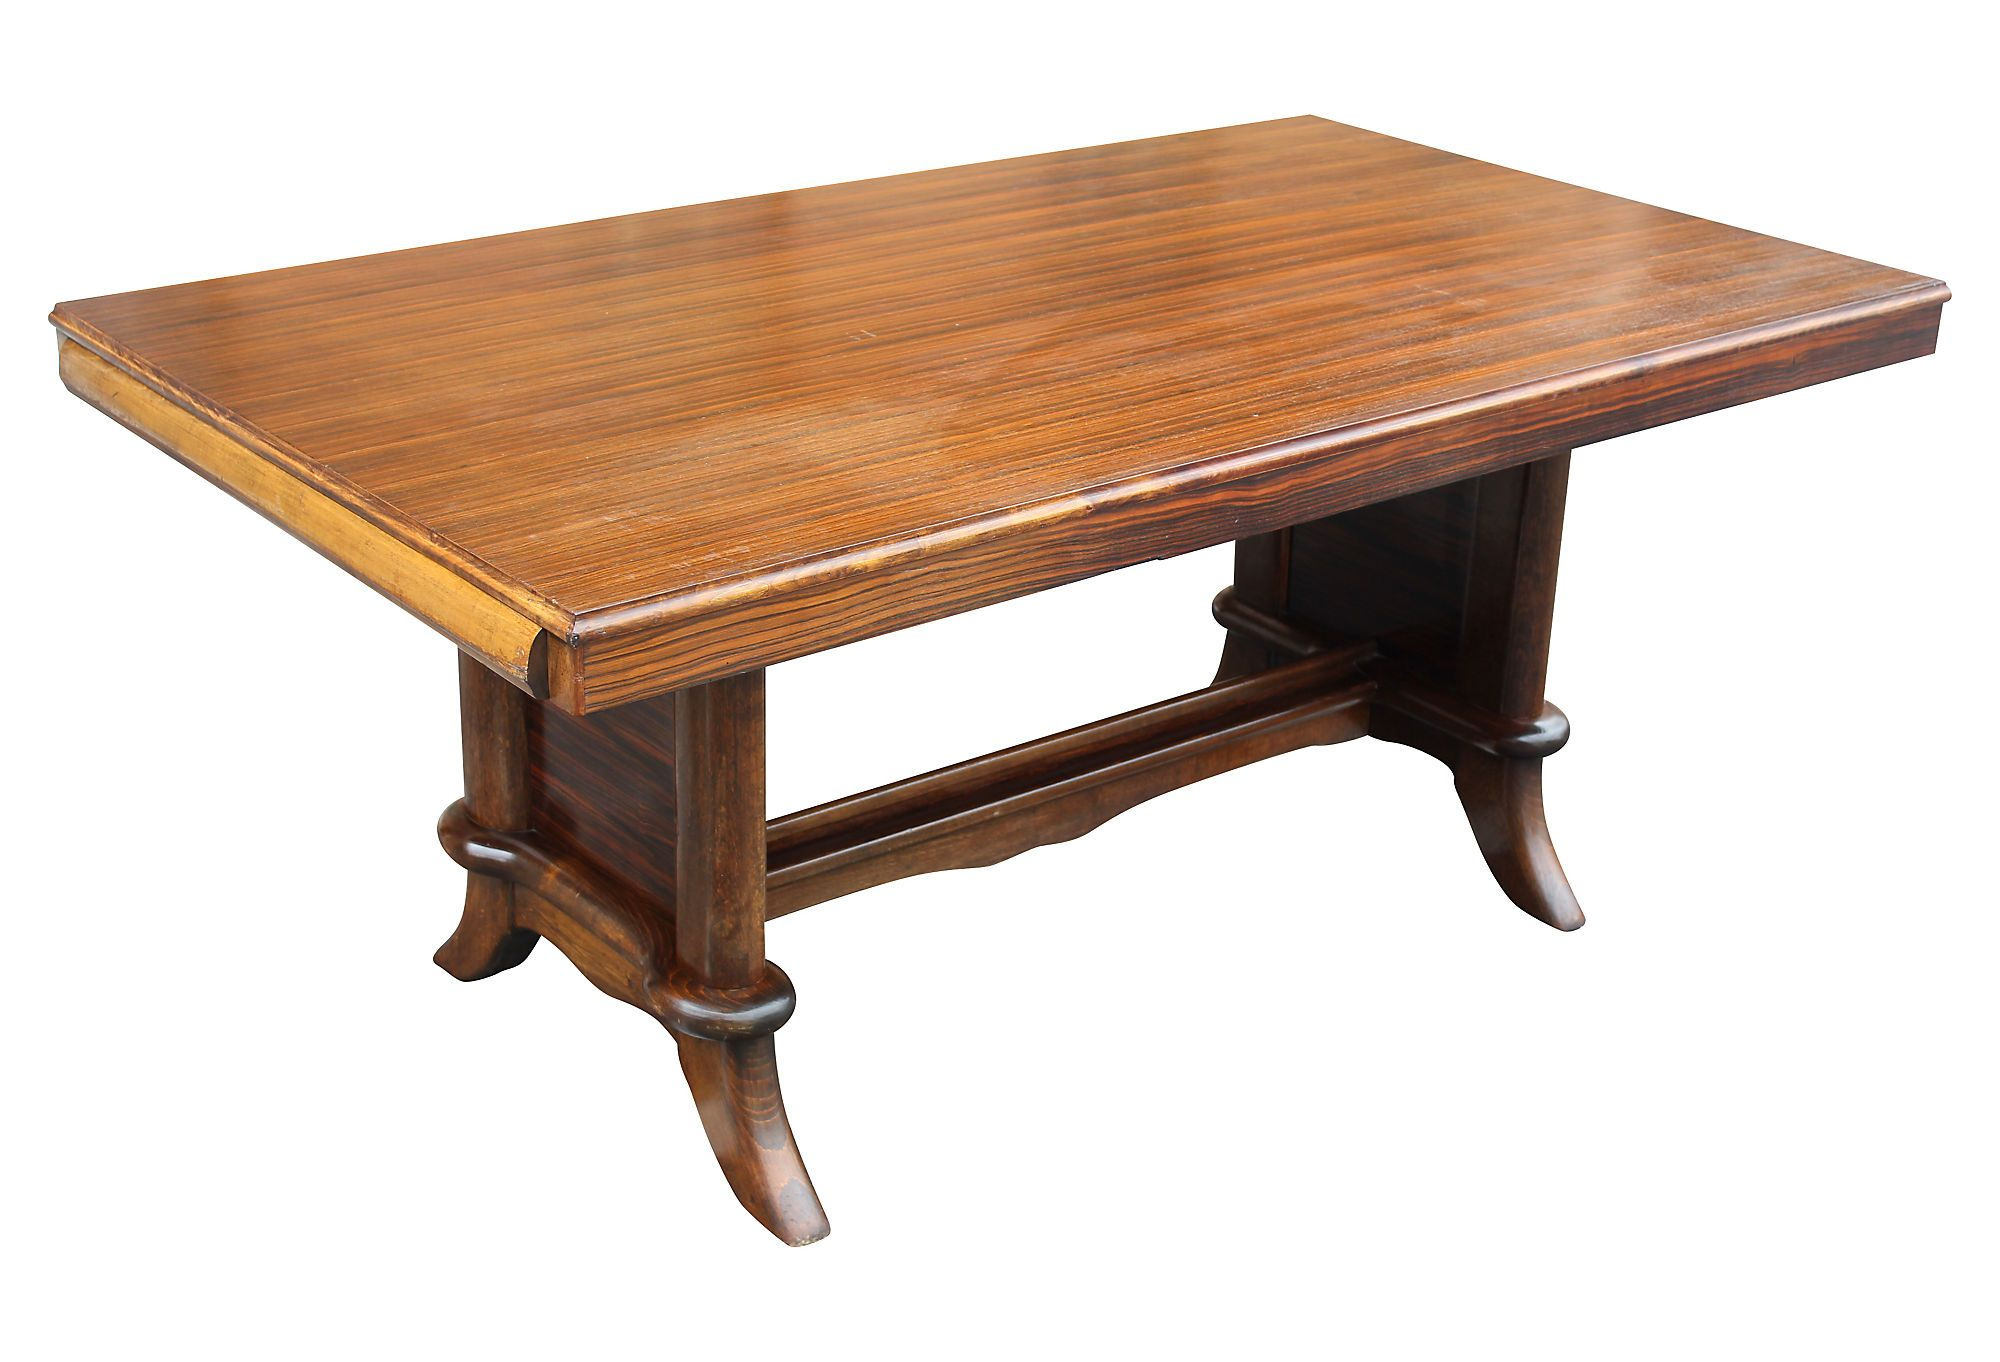 1940s Jacobean Style Nesting Tables S 3 e Kings Lane